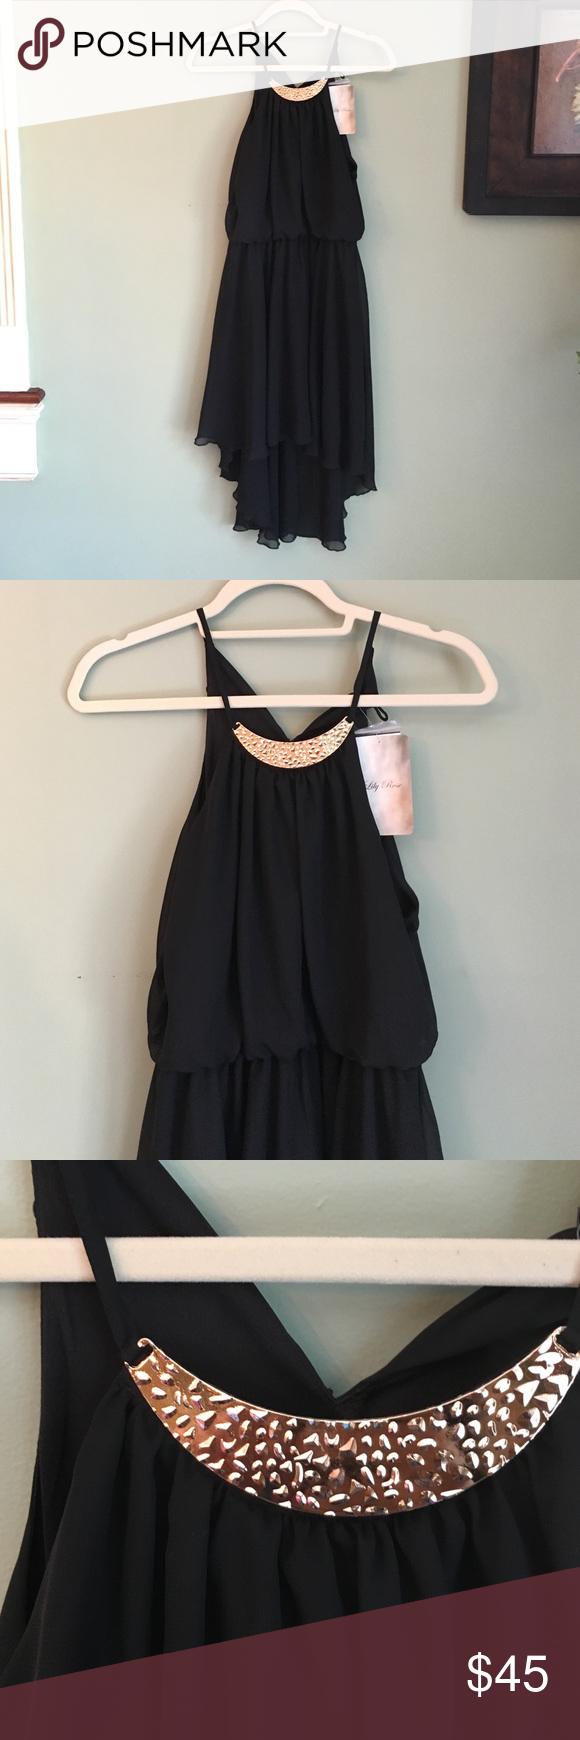 e972322a11da18 Black Midi/HighLow Black Dress w/necklace attached BRAND NEW. Black midi/  high low dress. With gold necklace attached. Lily Rose Dresses High Low